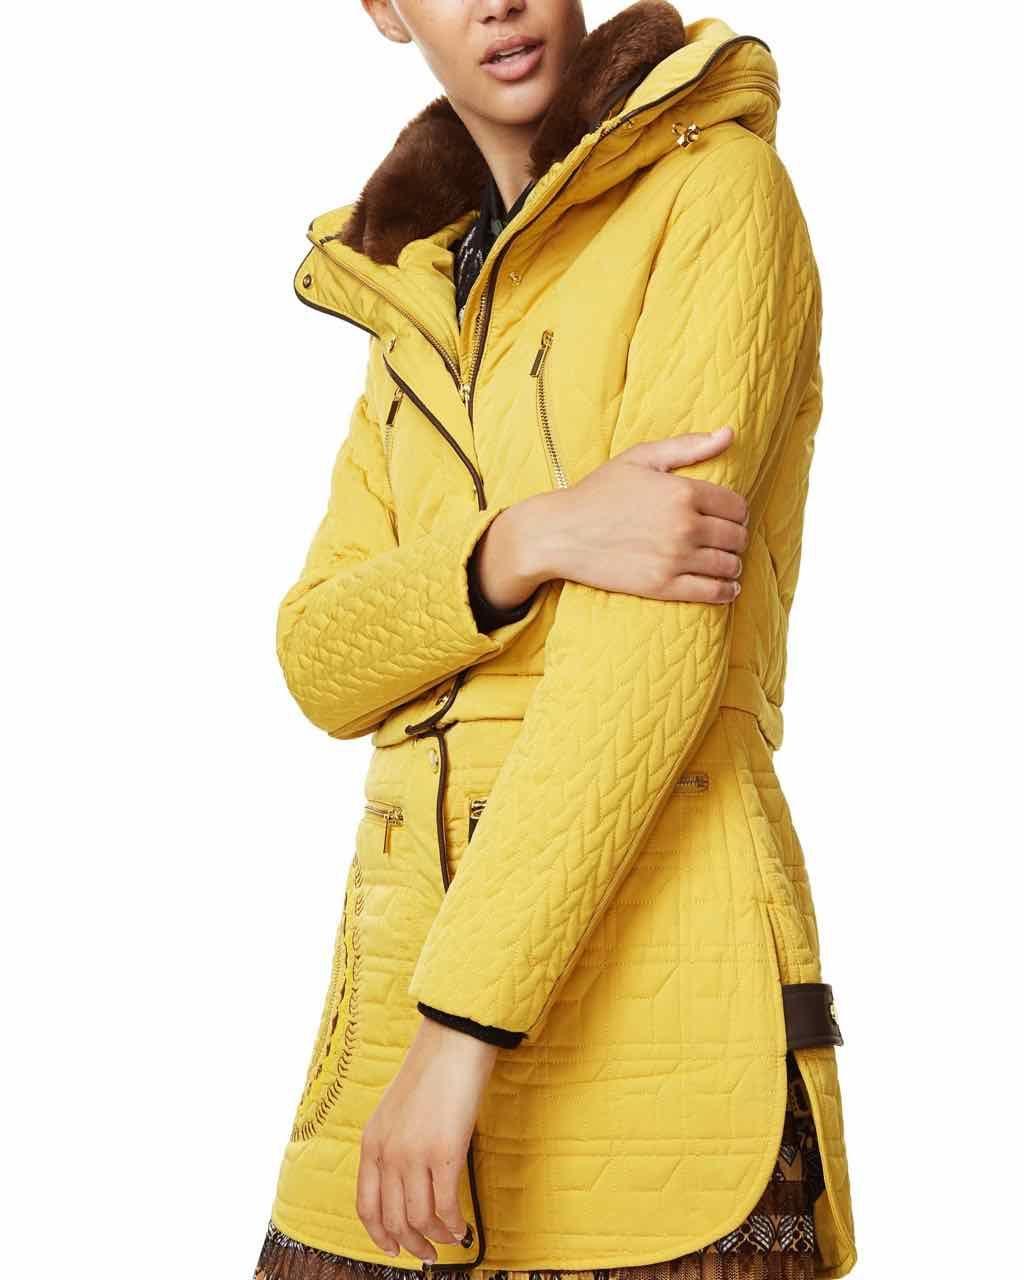 Desigual Coat California 17wwew52 Jacket Black Removable Buy Online Fall Winter Jacket Desigual Coat [ 1280 x 1024 Pixel ]